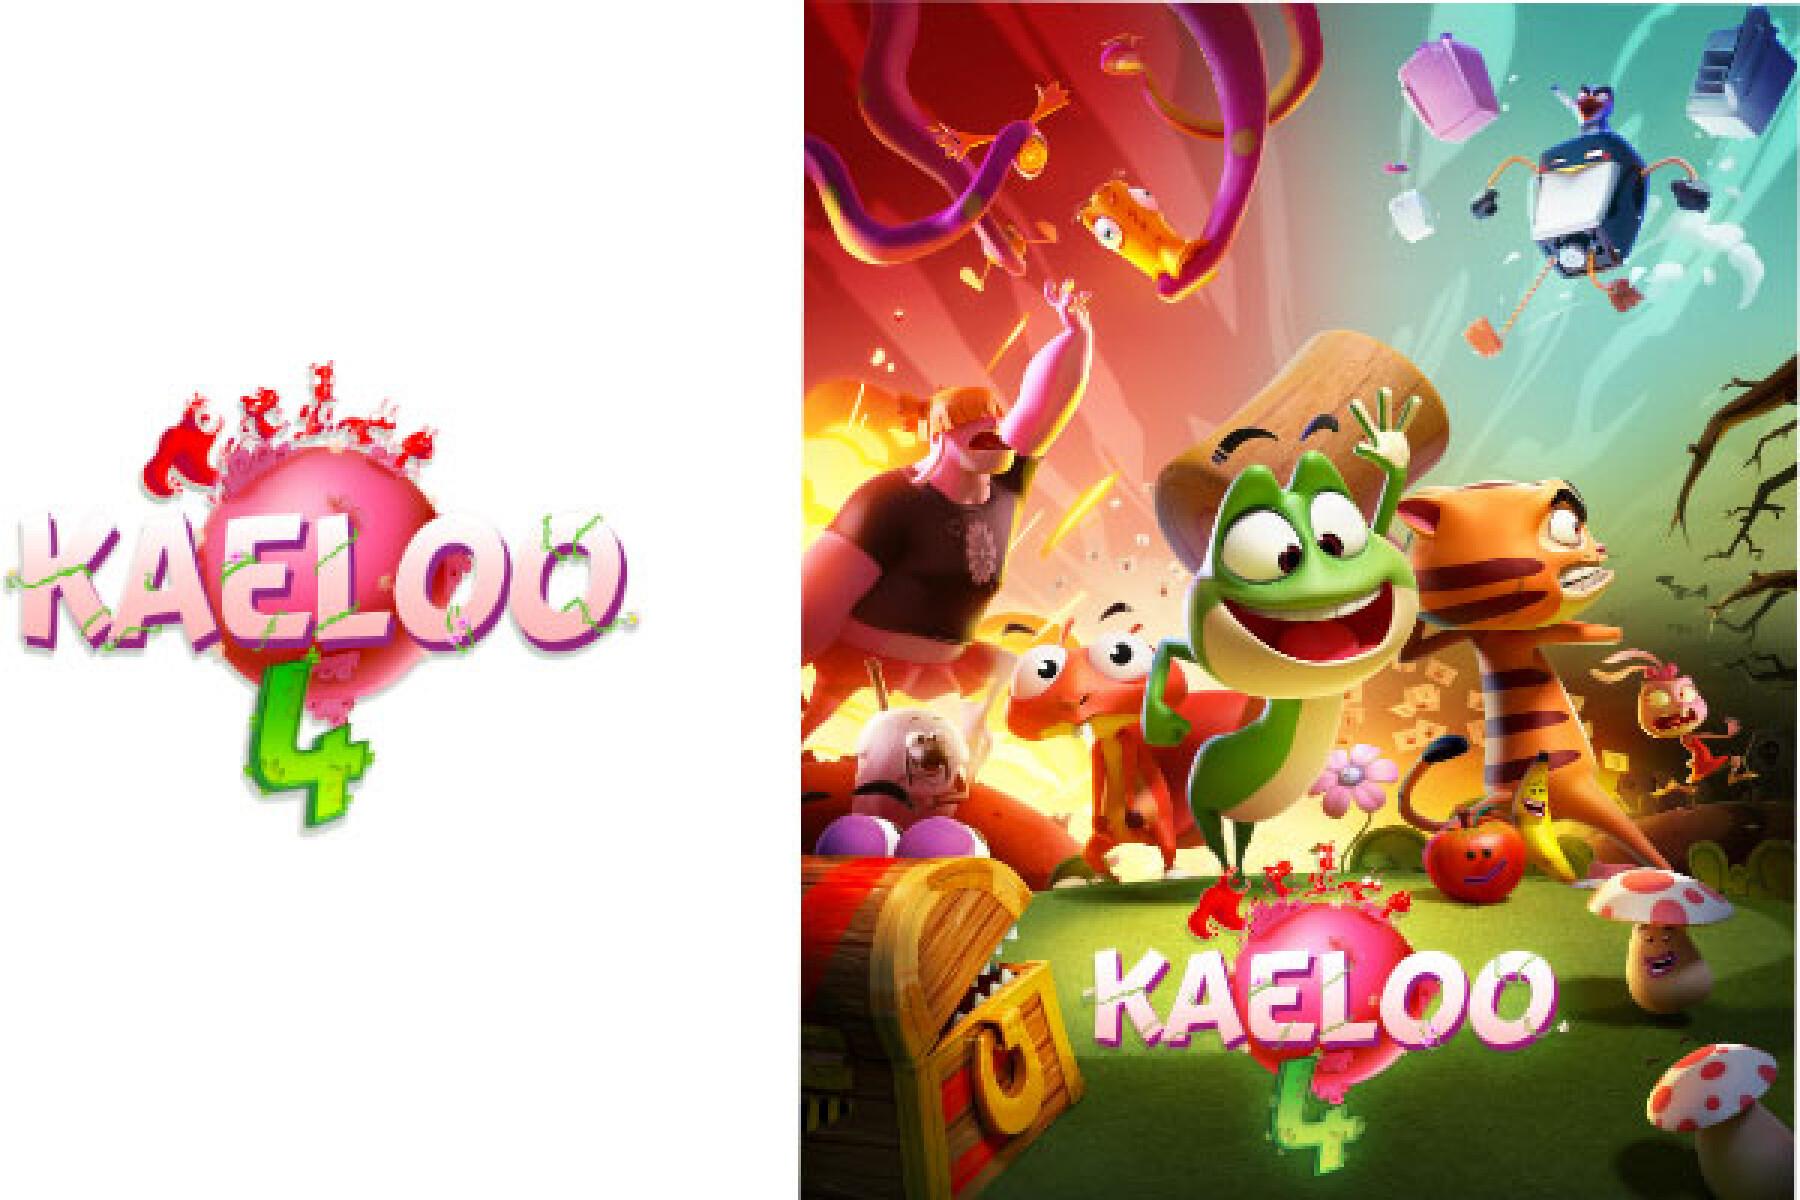 Kaleoo